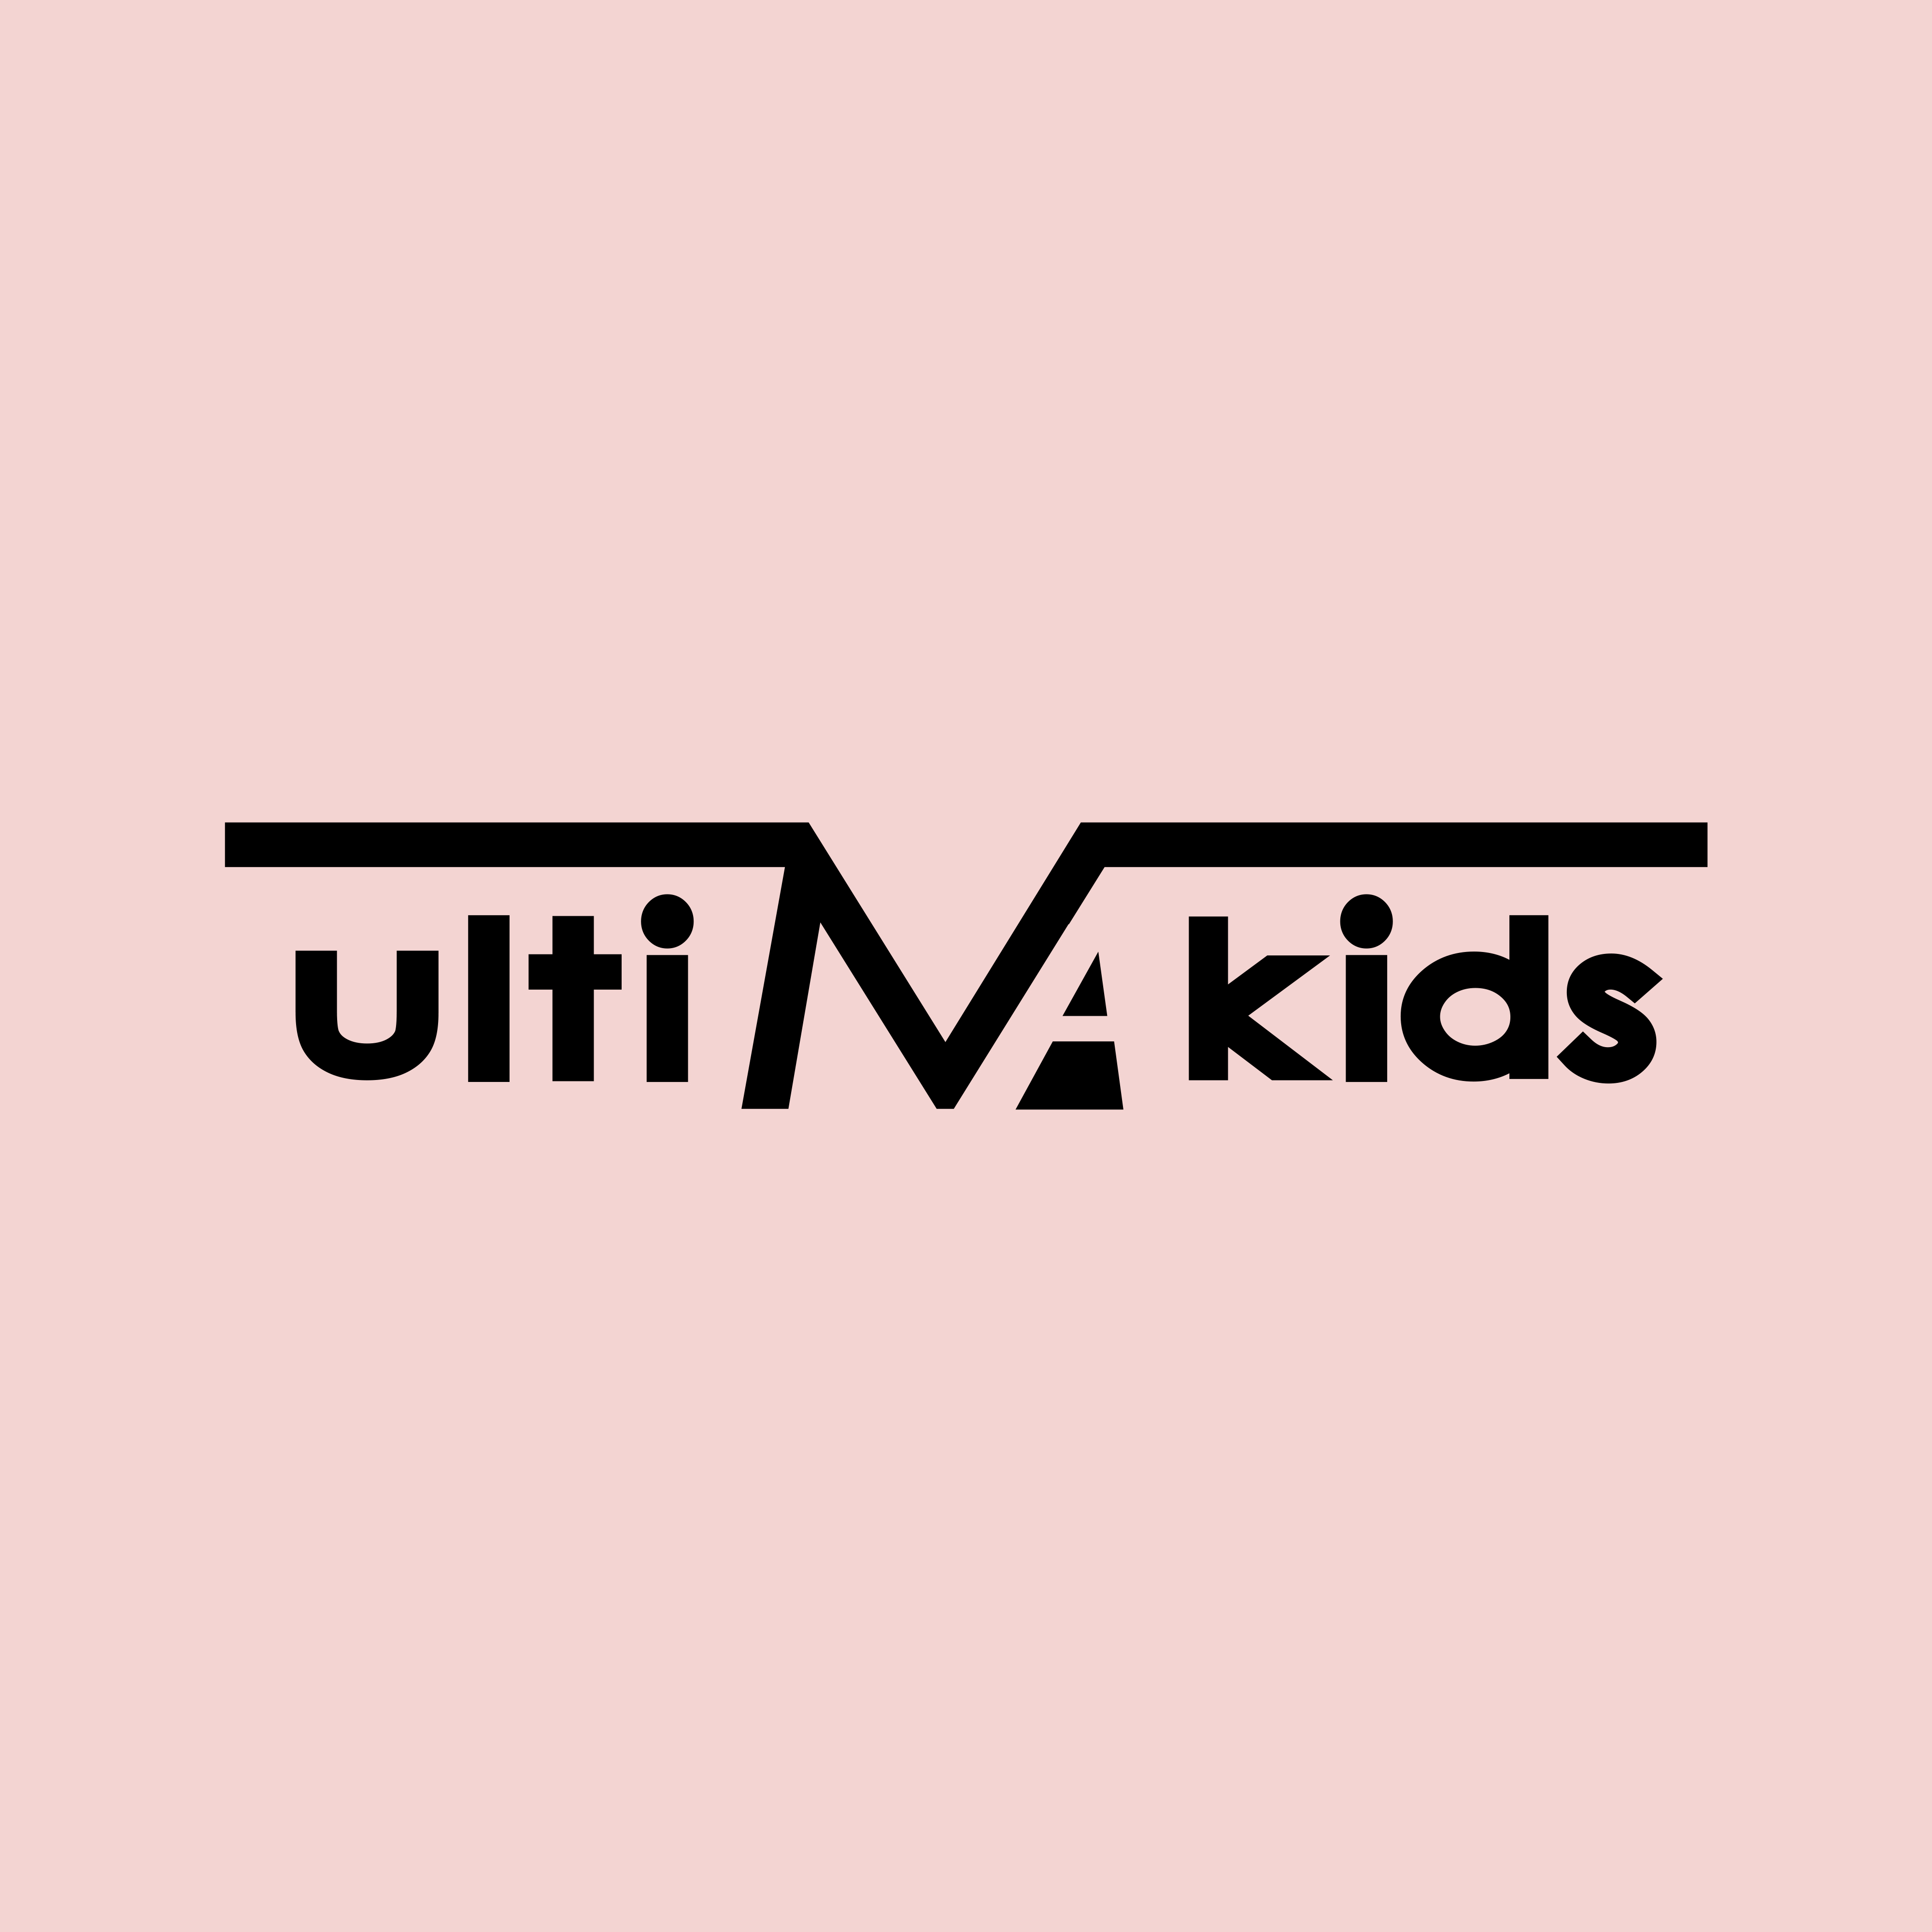 Дизайн логотипа для детского магазина фото f_9595bc3ca56d7f10.jpg